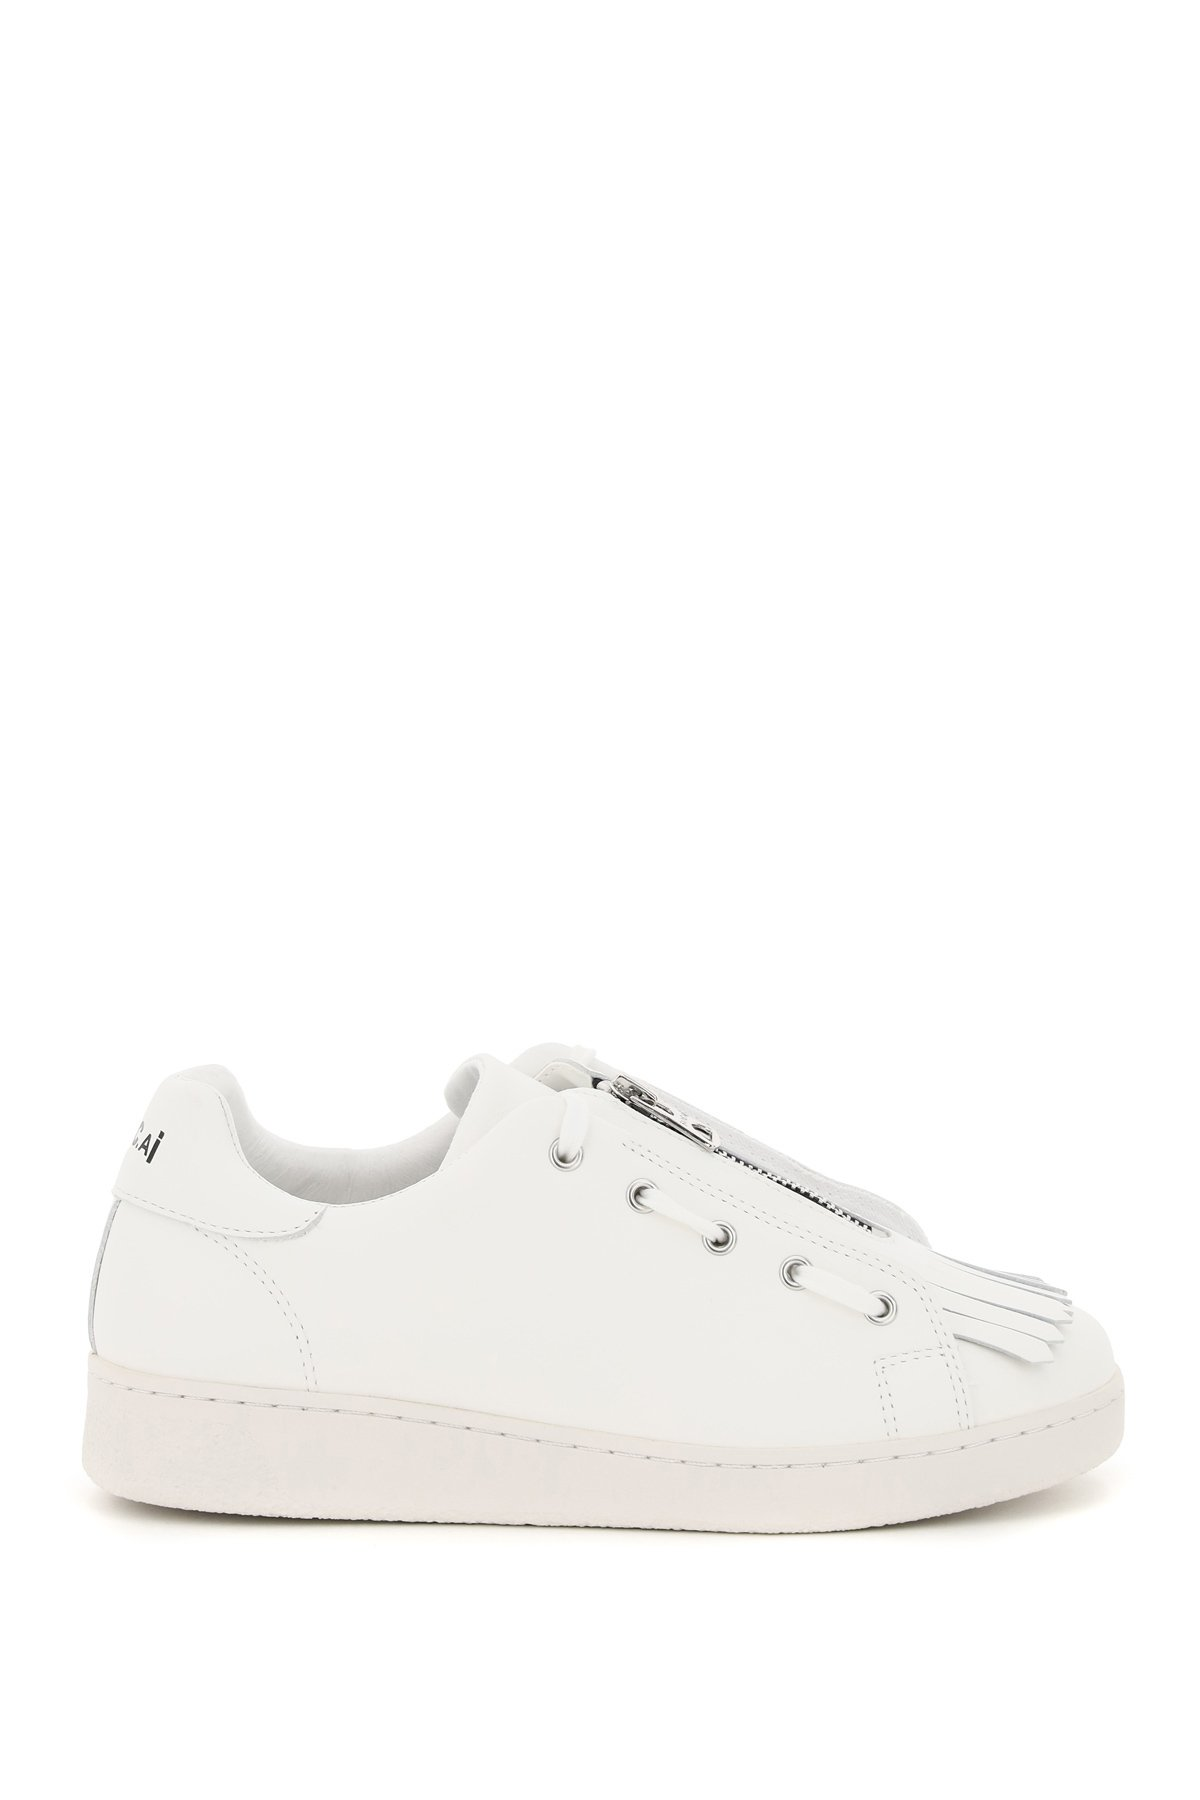 A.p.c x sacai sneakers minimal julietta